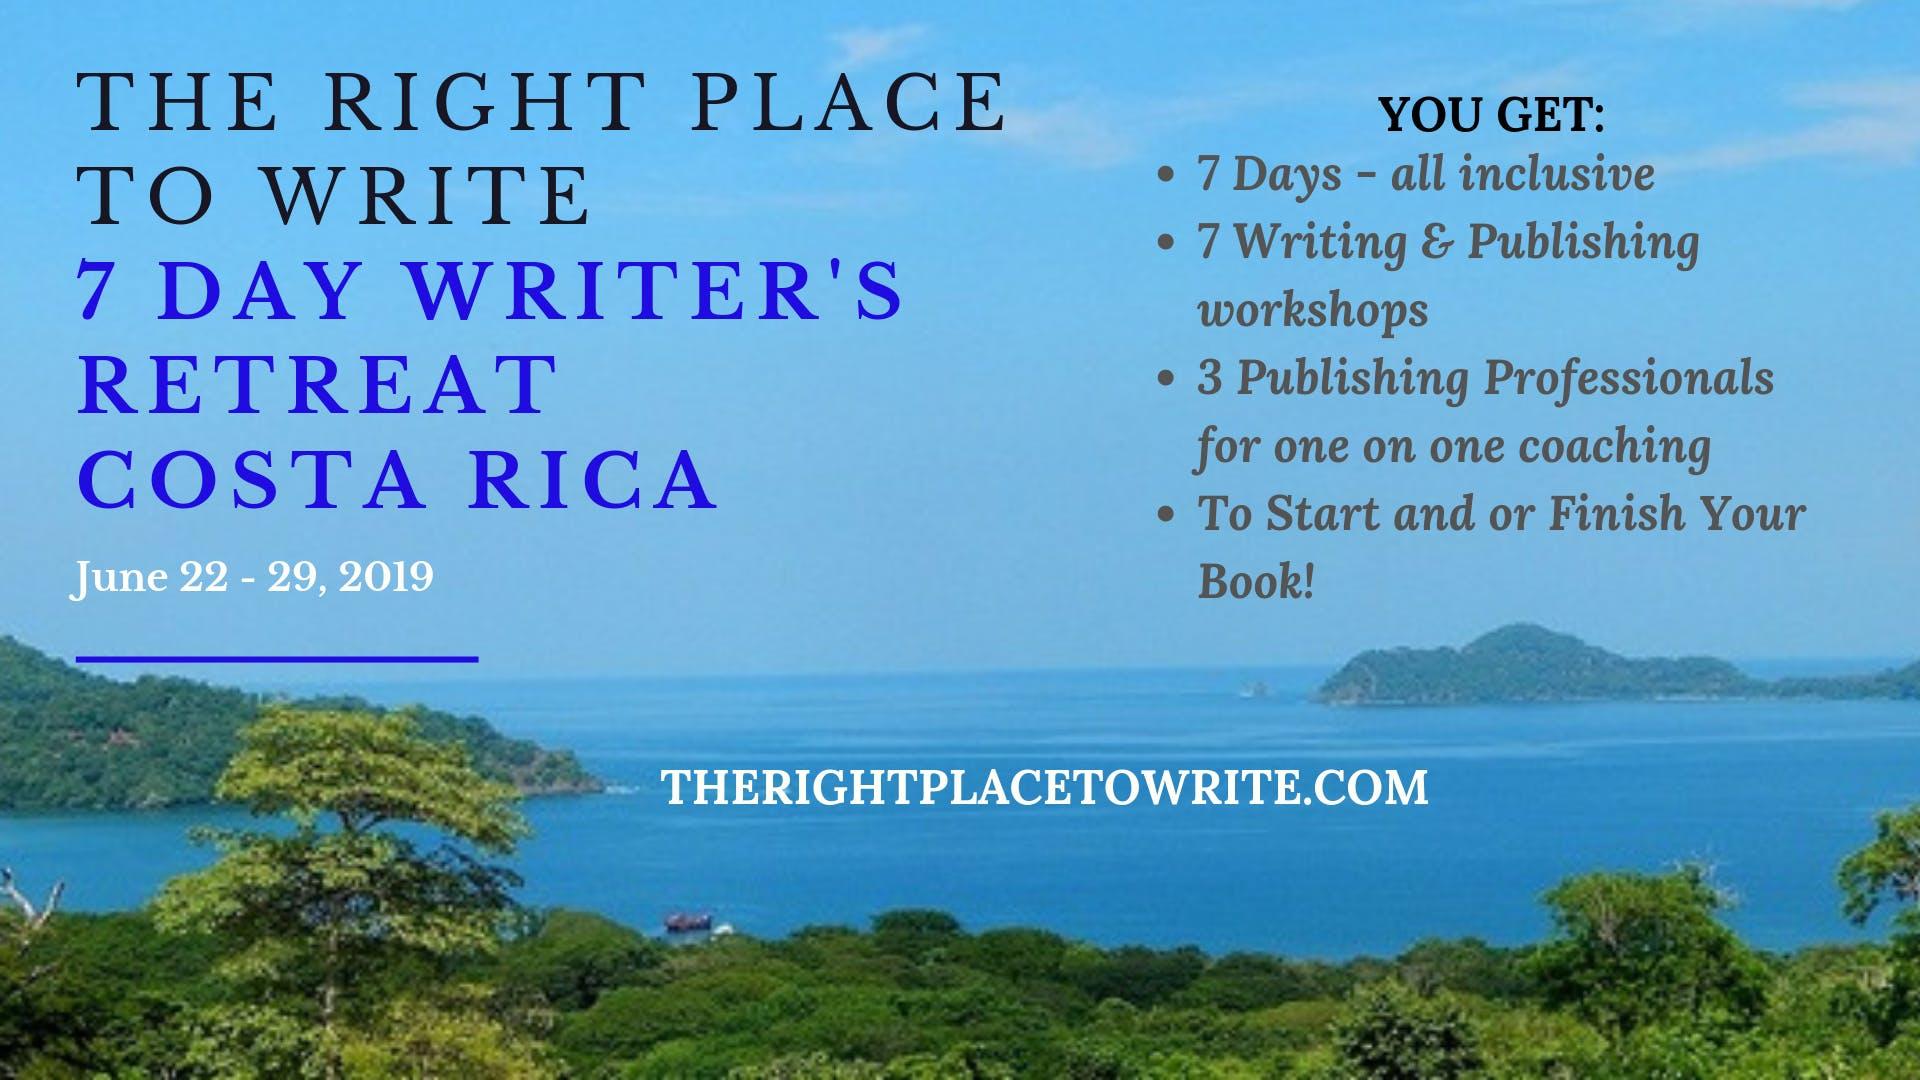 Apply for Free - Writer's Retreat June 2019 Costa Rica